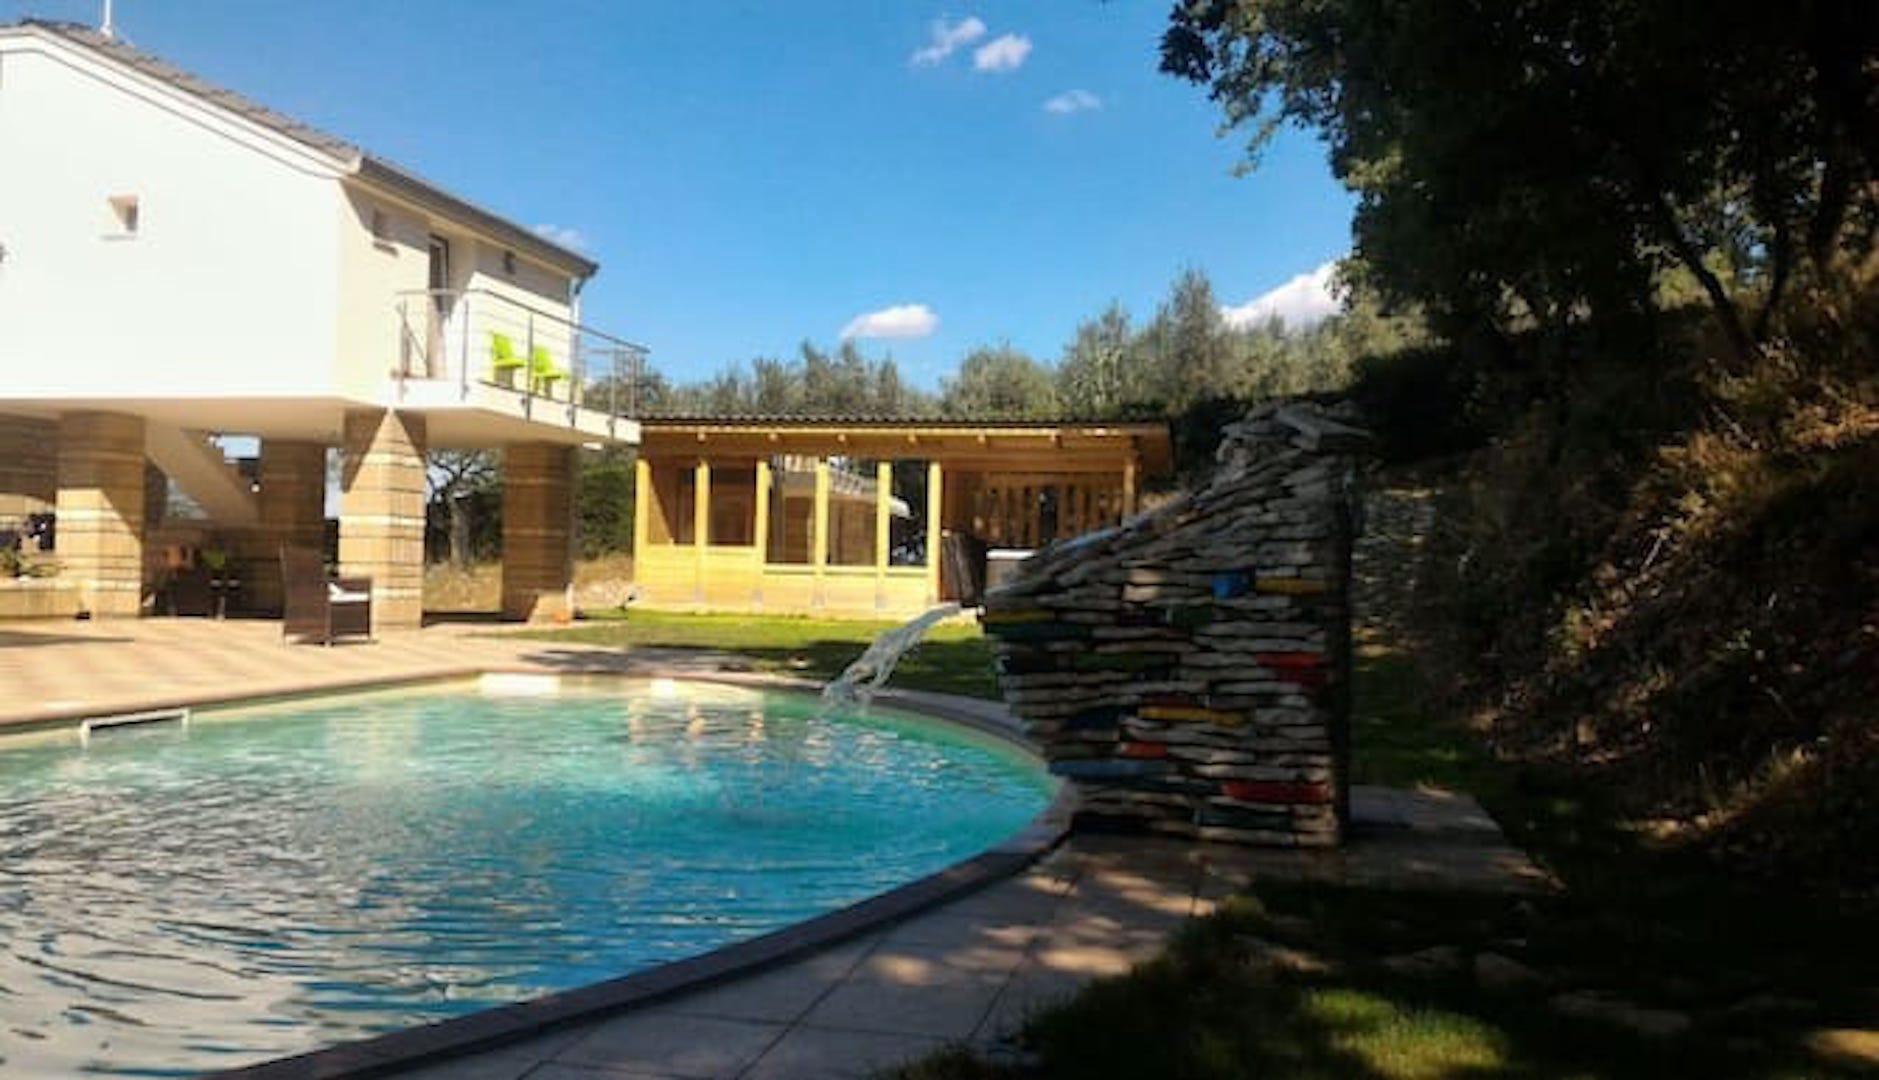 A large pool of water at Fabula Ventis B&B Resort.